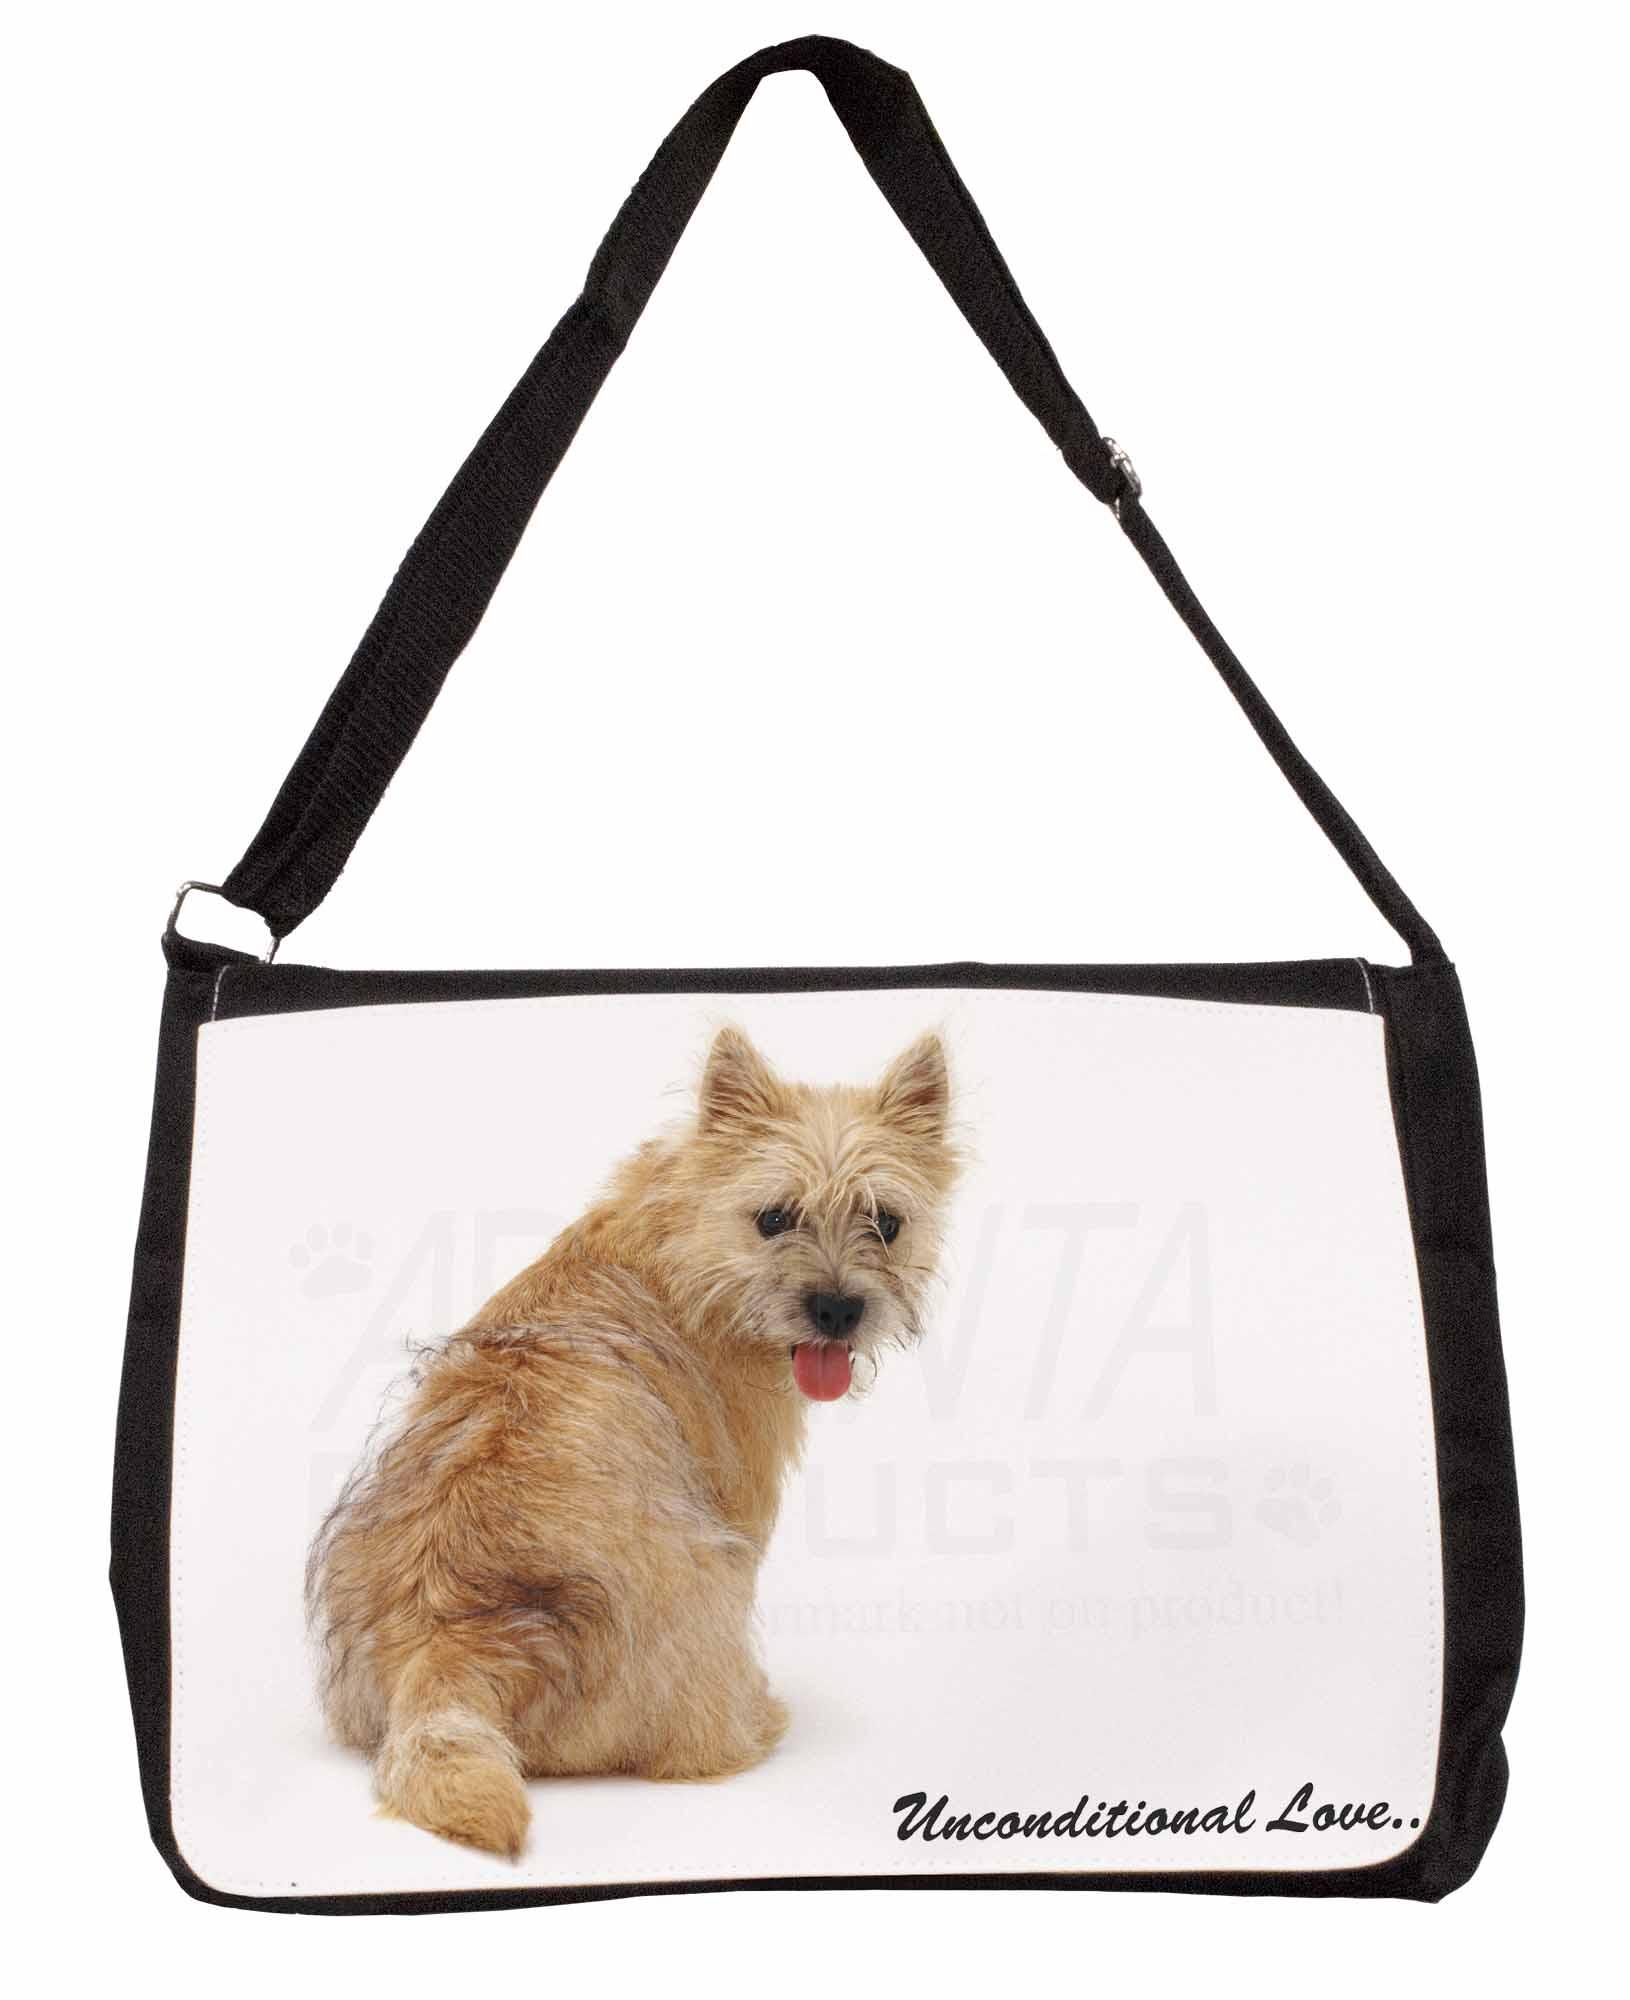 98e6a542103d Details about Cairn Terrier Dog With Love Large Black Laptop Shoulder Bag  School/Co, AD-CT1uSB